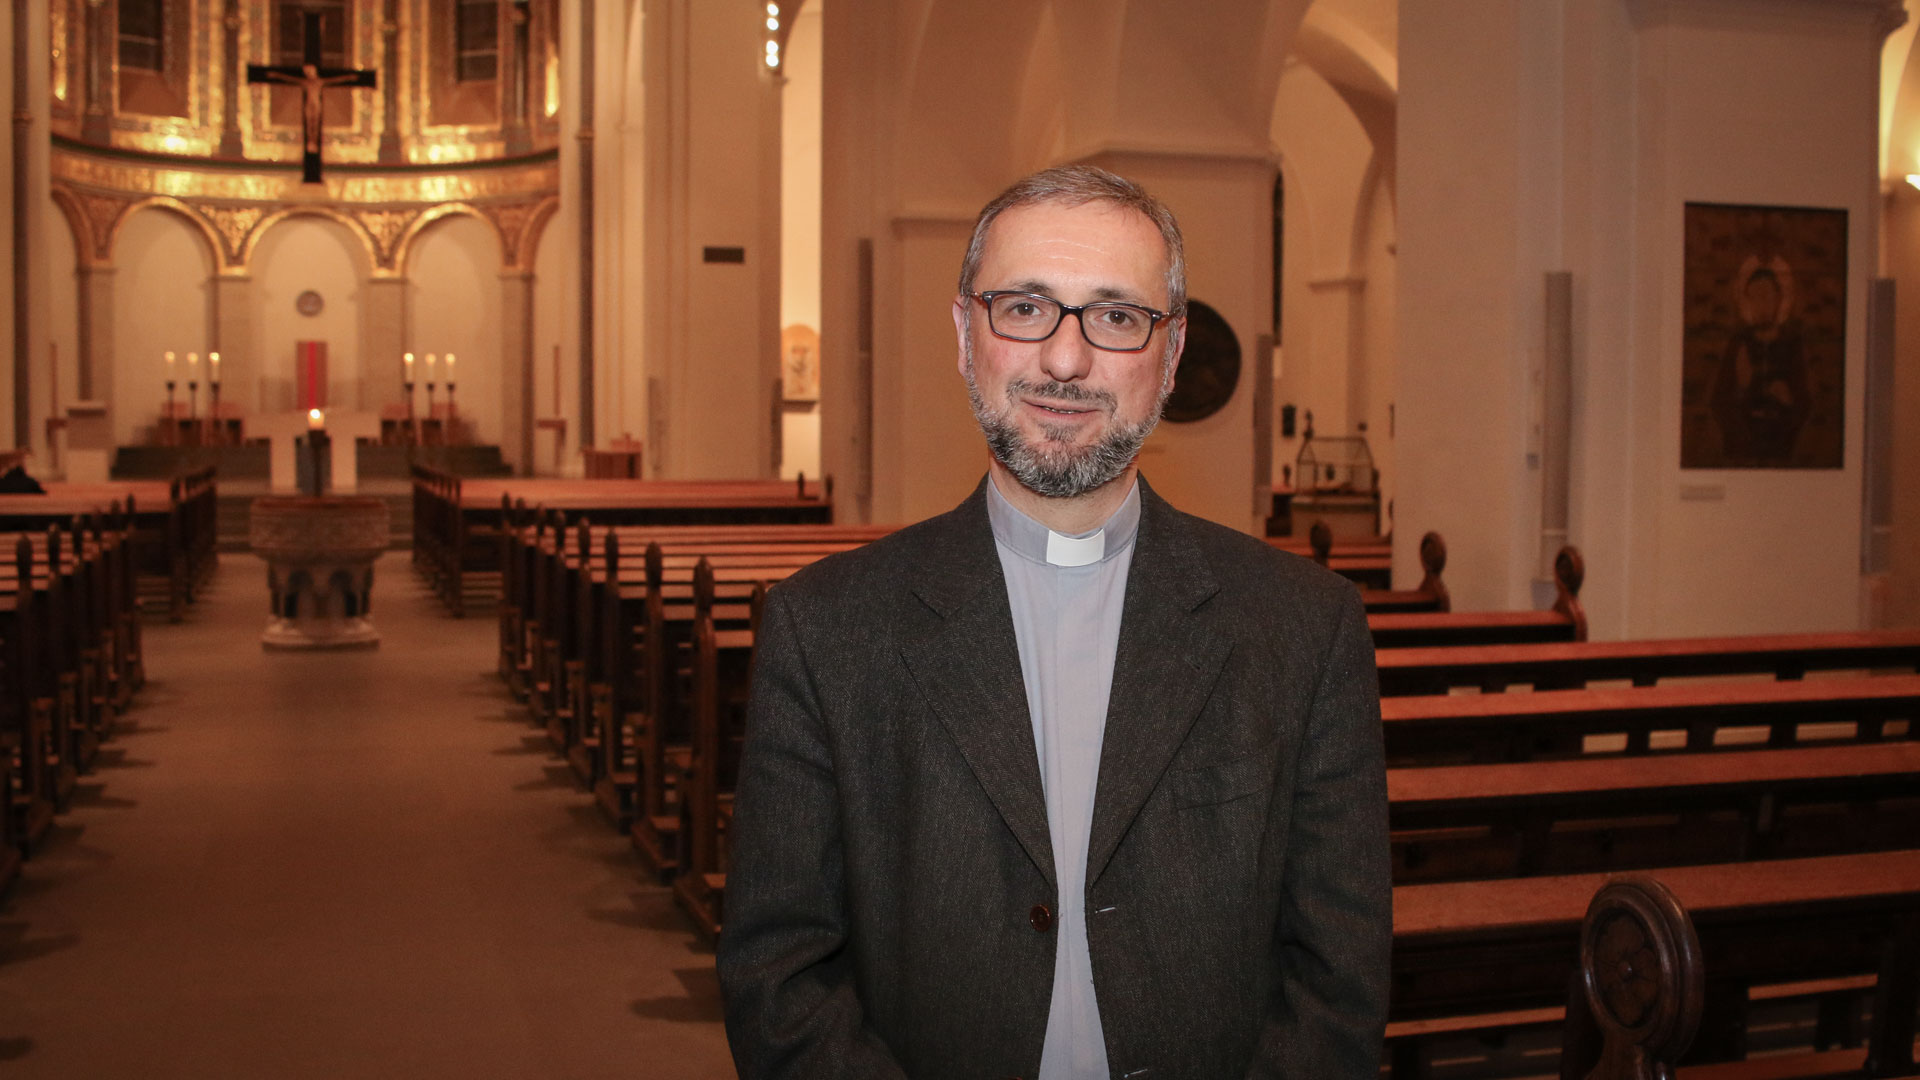 Monseñor Hesse